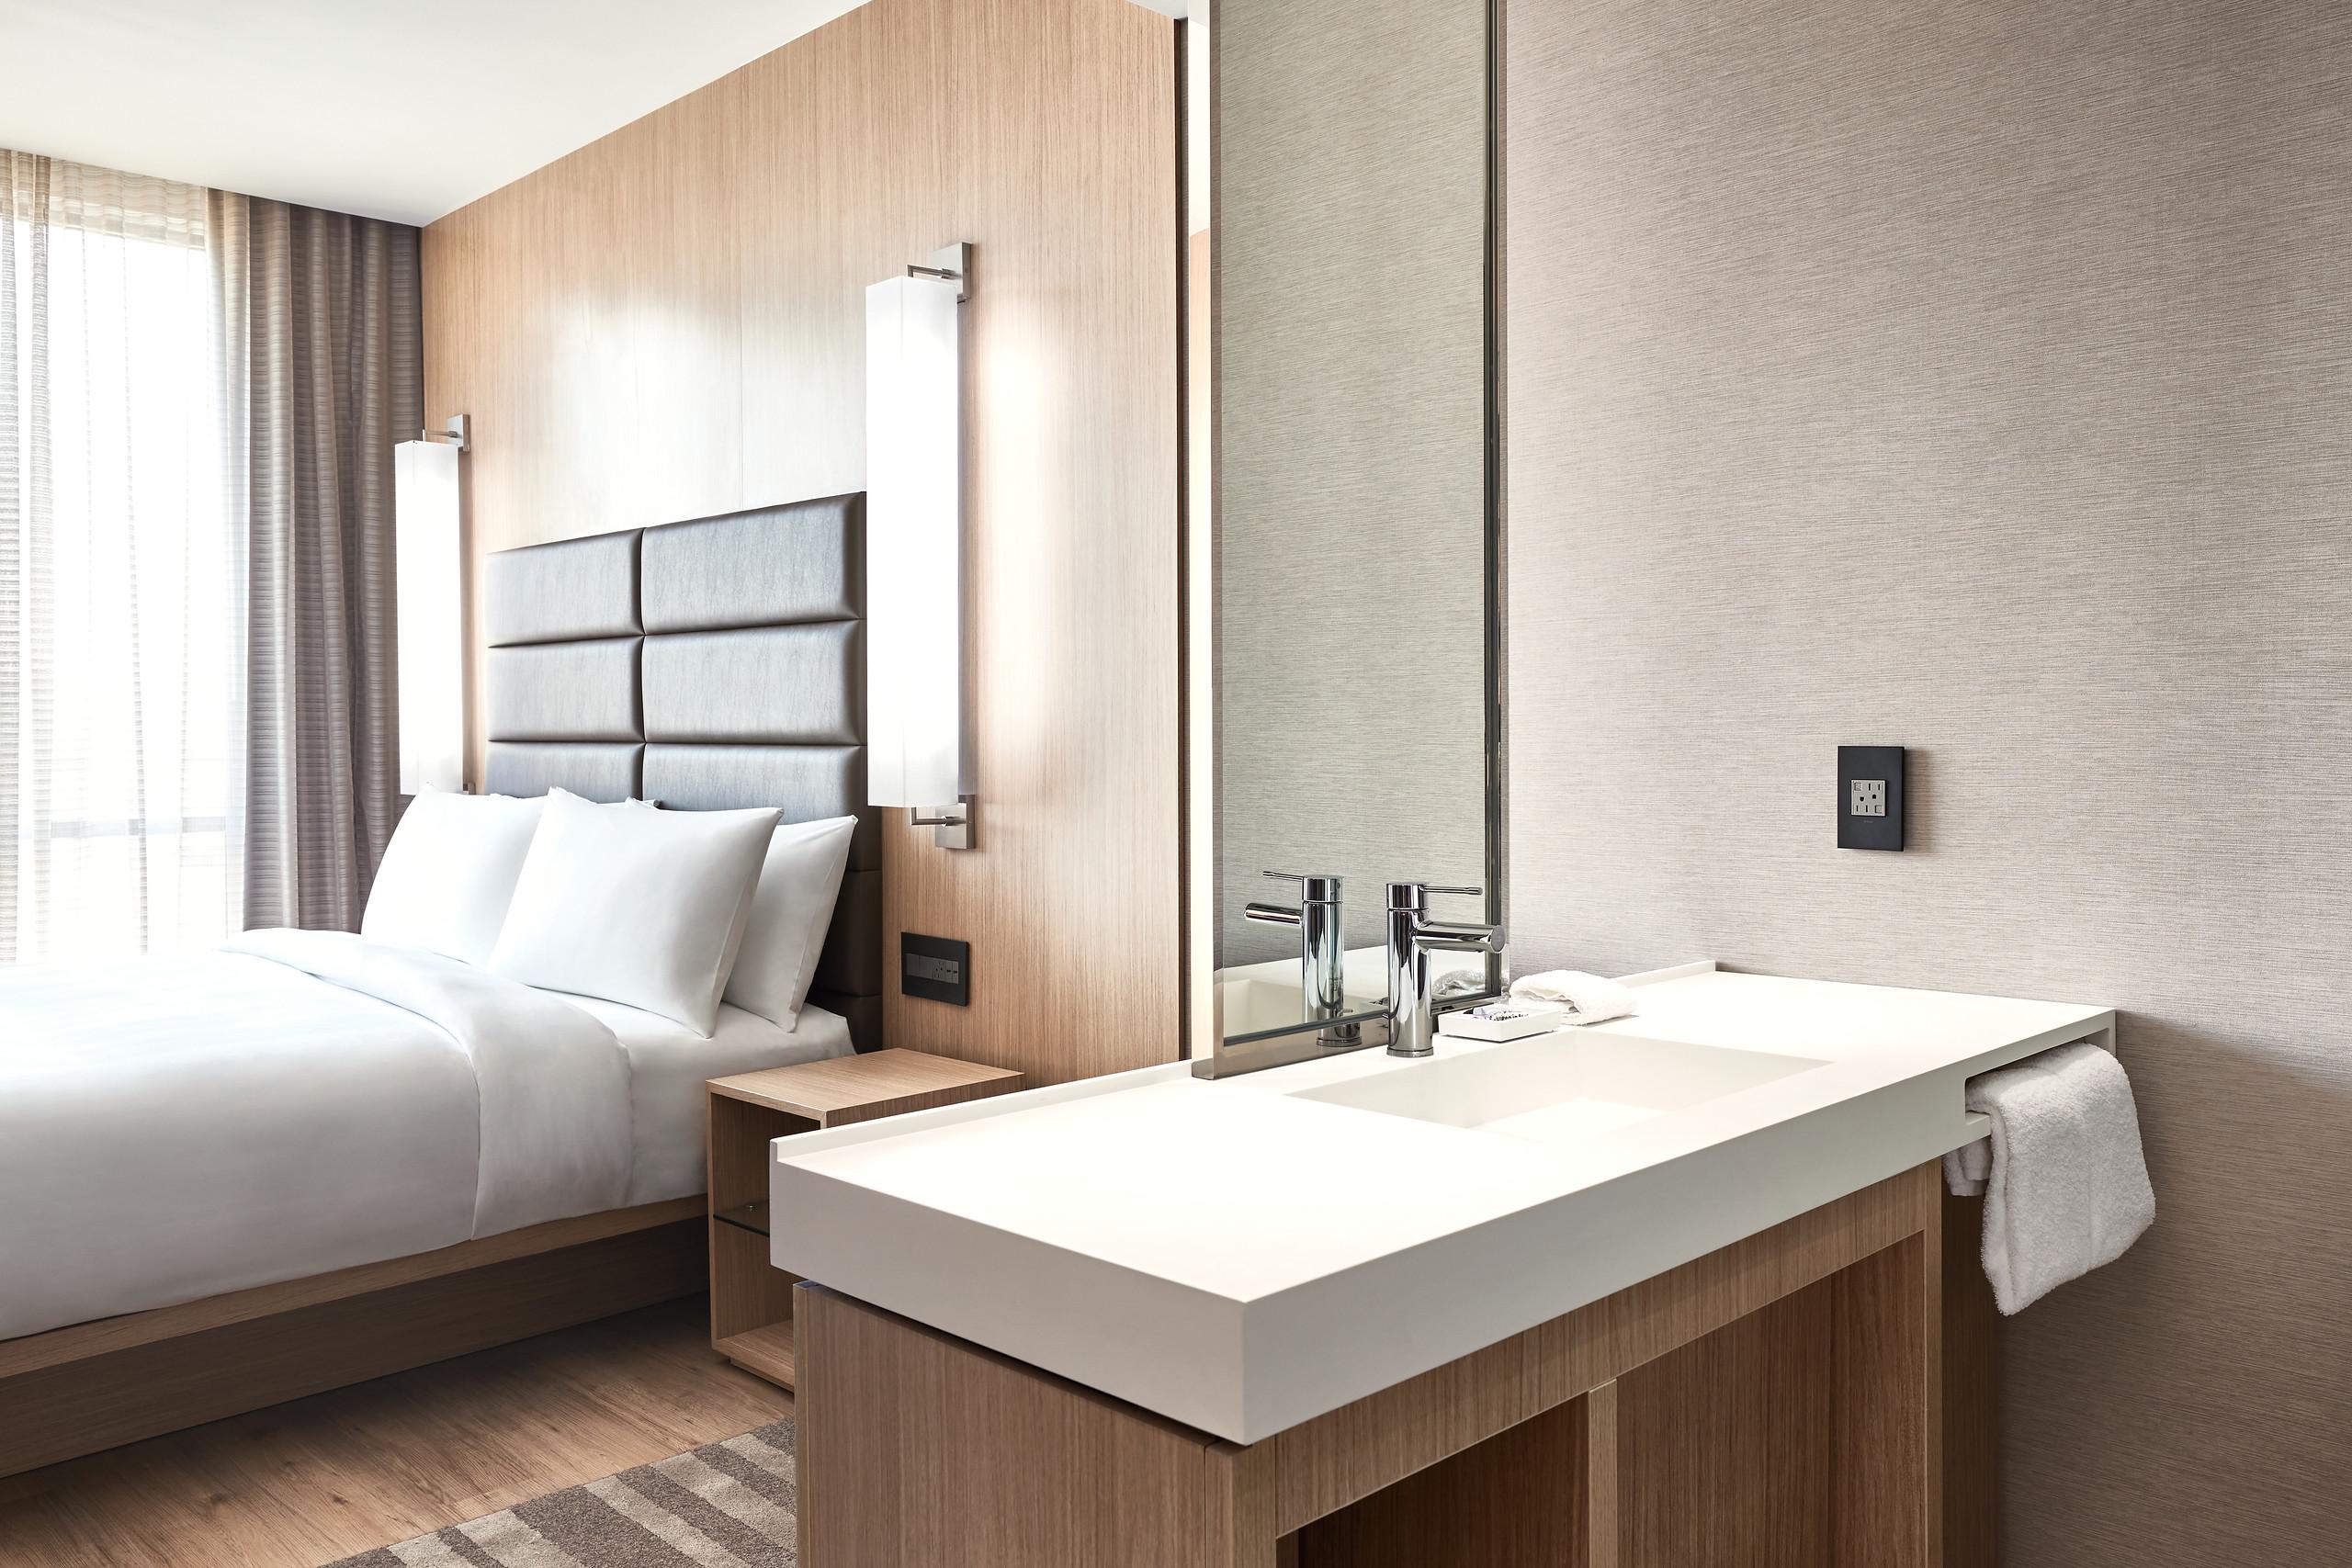 AC_Frisco_Guest Room